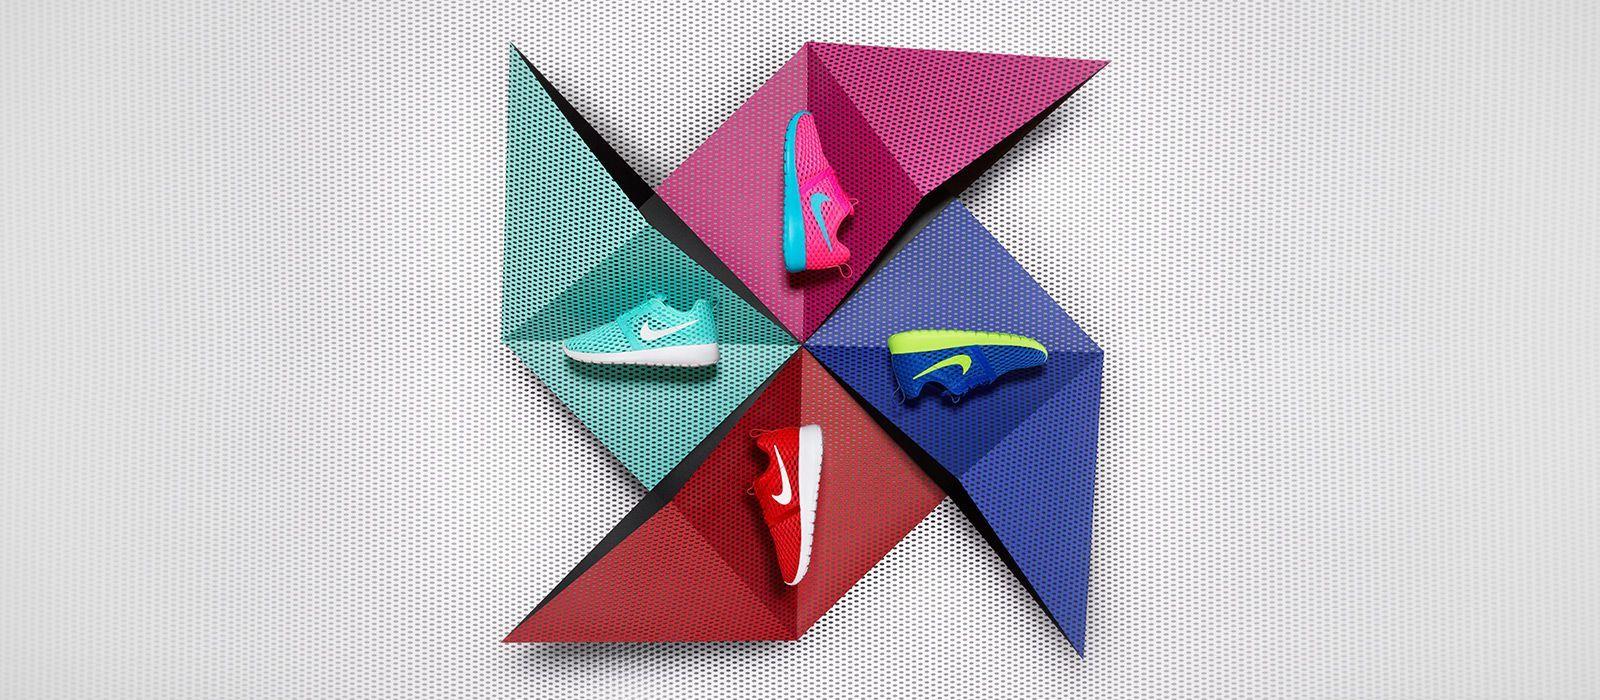 nikeroshebreathekidsshoe.jpg Nike campaign, Nike